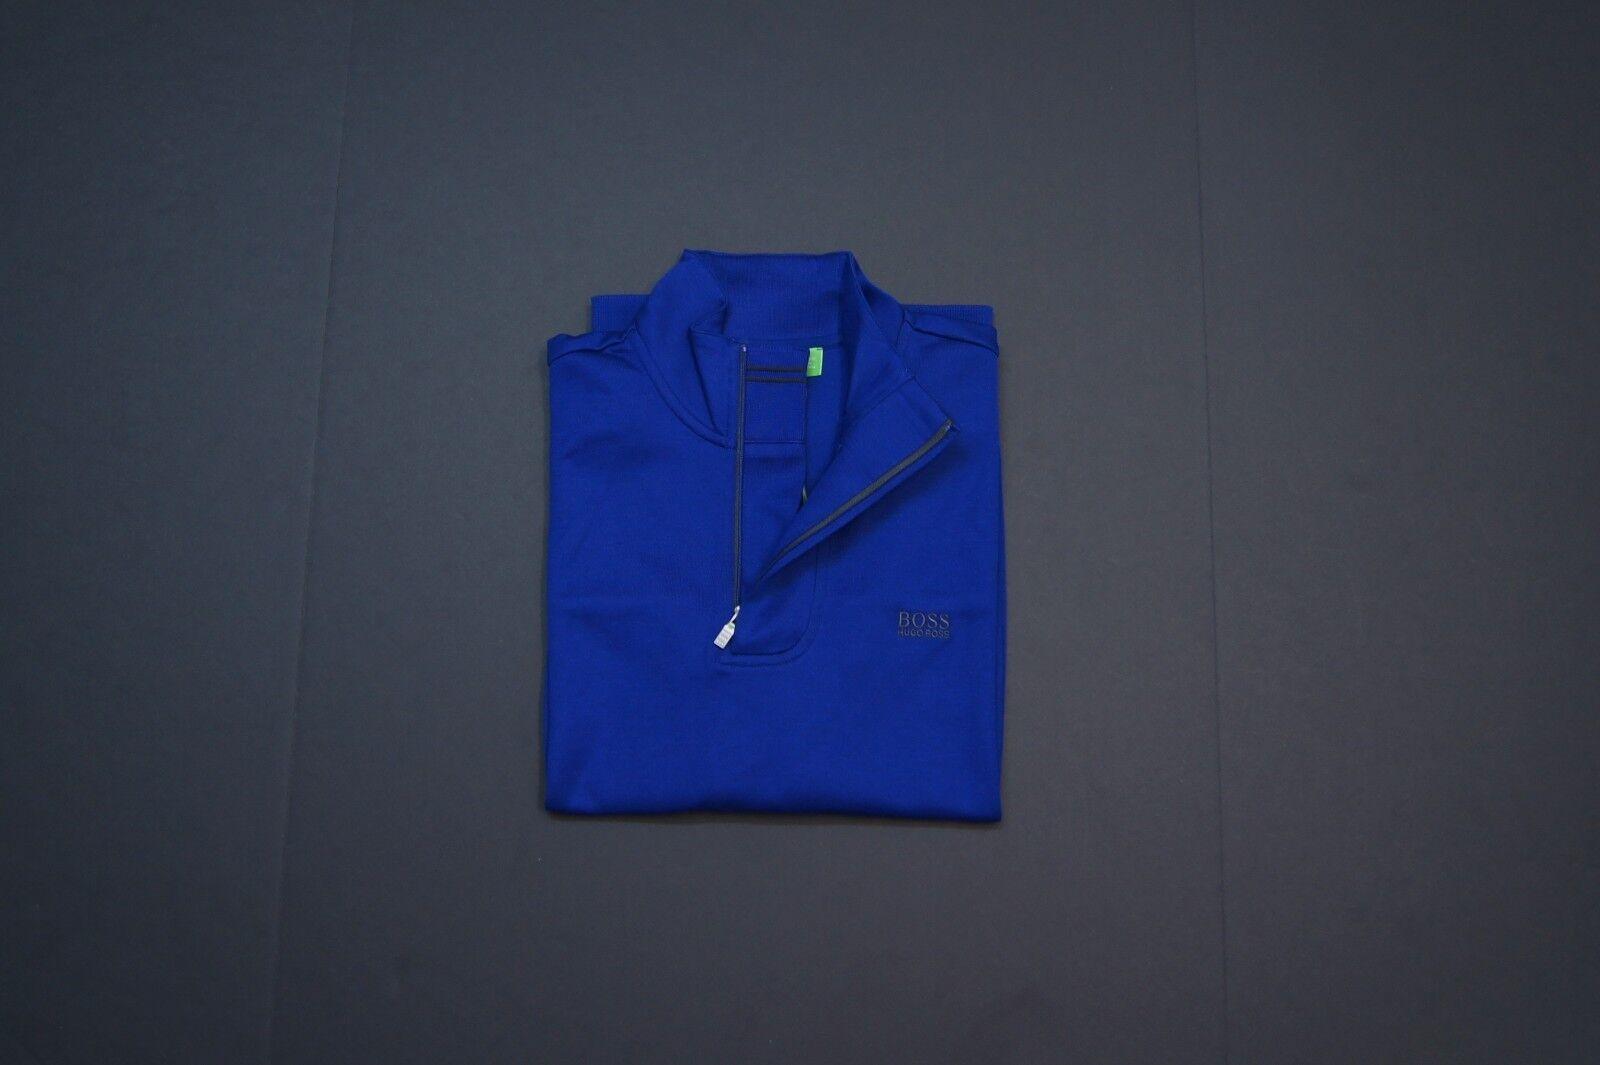 BOSS Grün by HUGO BOSS 'Sweat' 1/4 Zip Sweatshirts Royal Blau NEW NWT